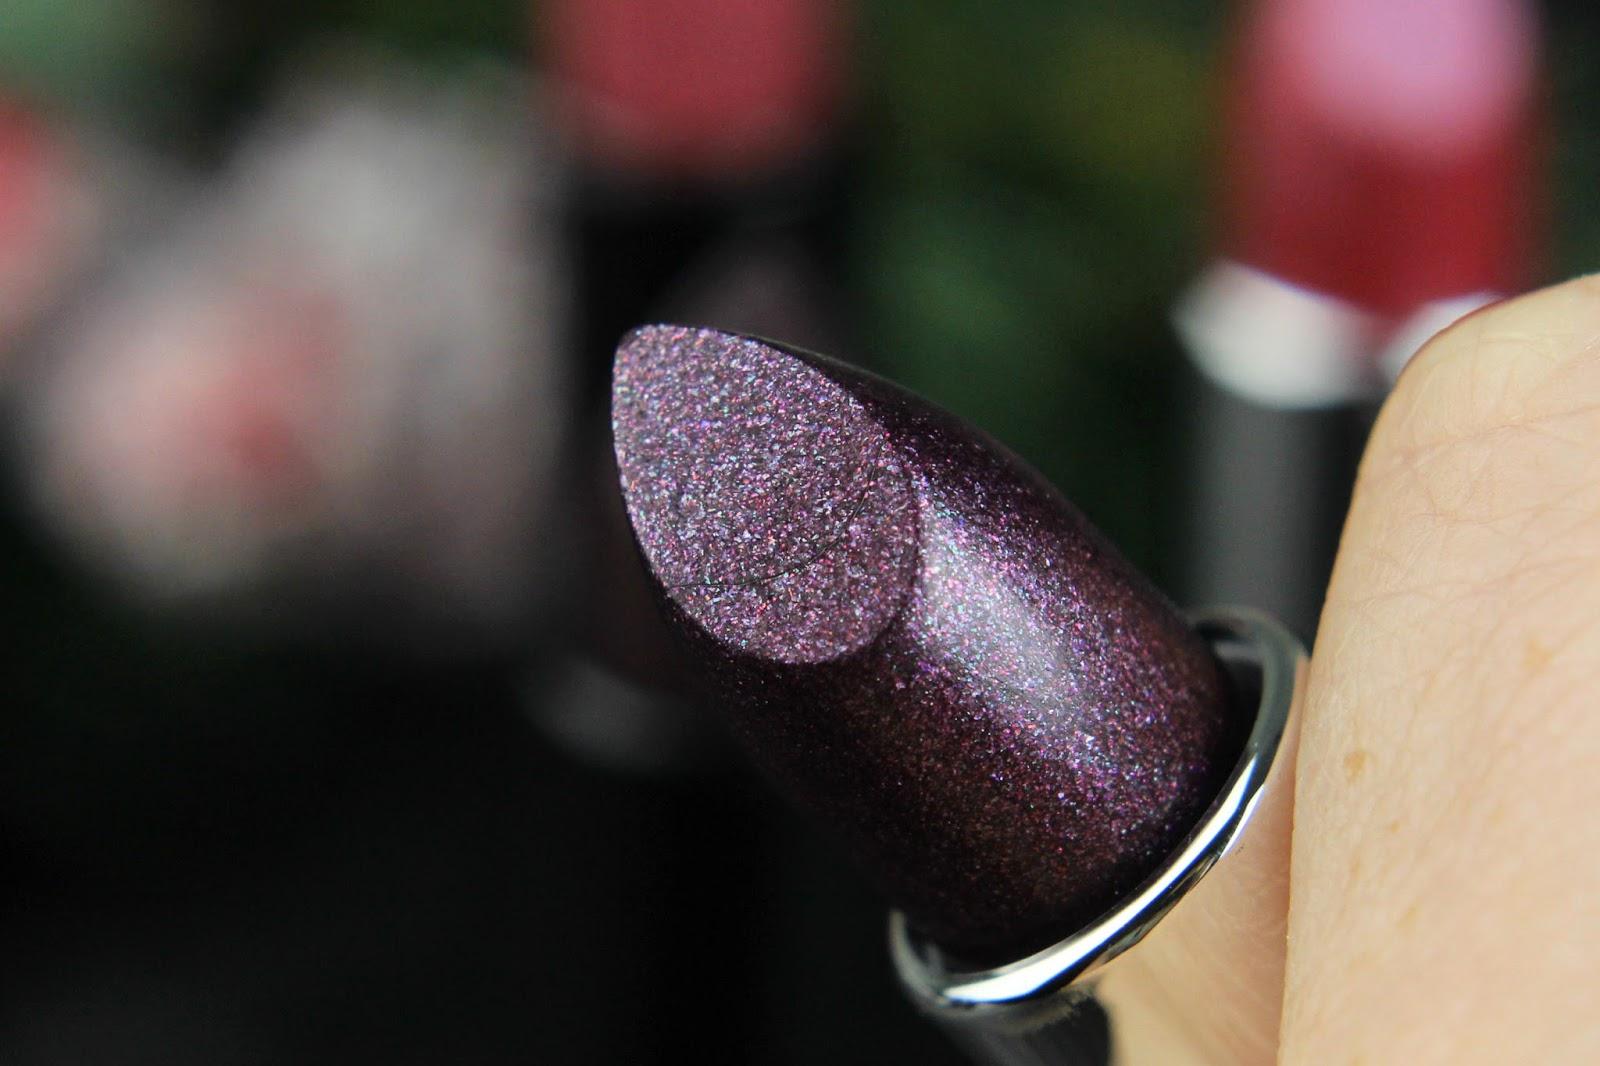 dm drogeriemarkt, drogerie, glamour, glitter, glitzer, lila, lippenstift, lipstick, nagellack, nailpolish, review, secret desire, silber, silvester, swatches, tragebilder, trend it up, trendfarben,